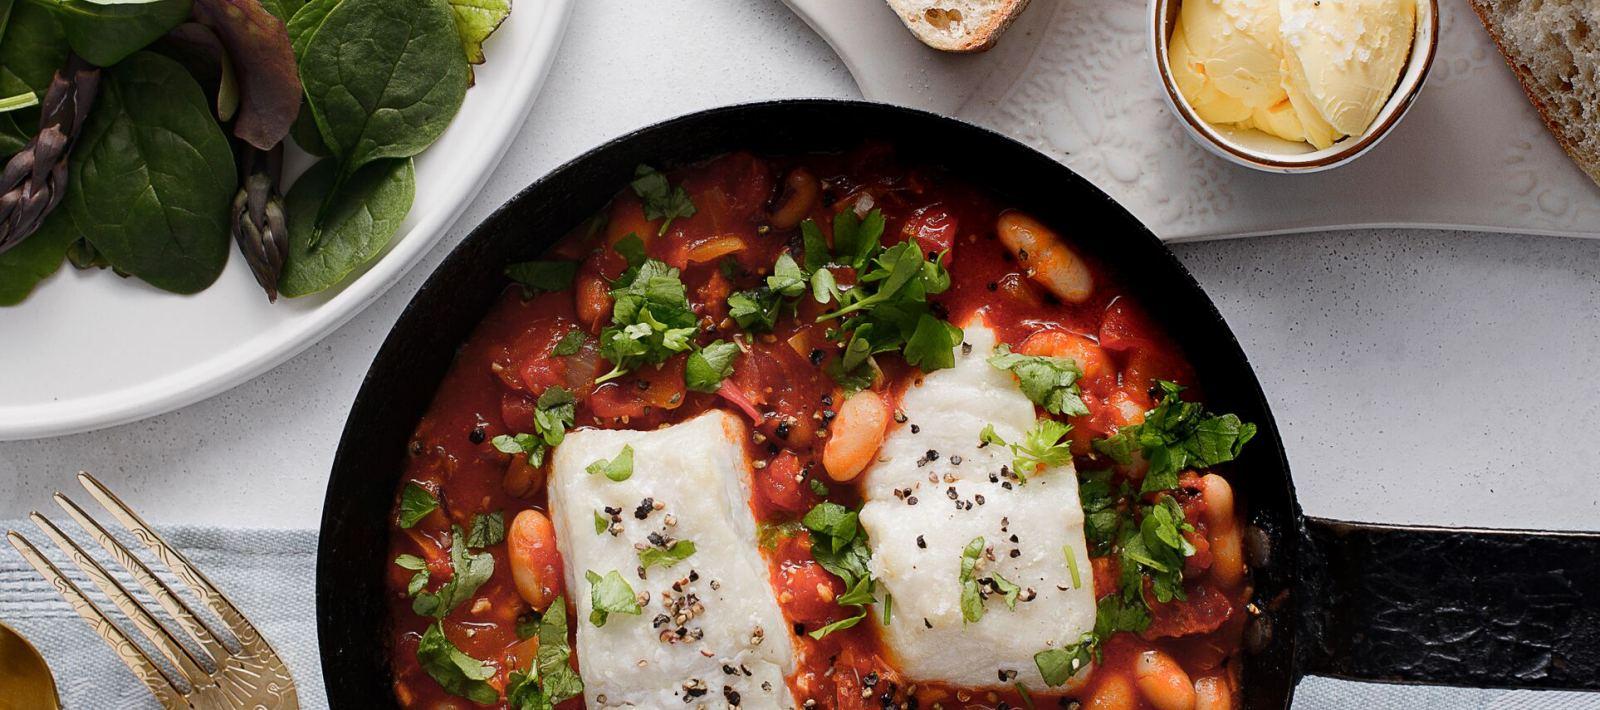 The Lincolnshire Chef Cod and Chorizo Stew recipe for IshFish